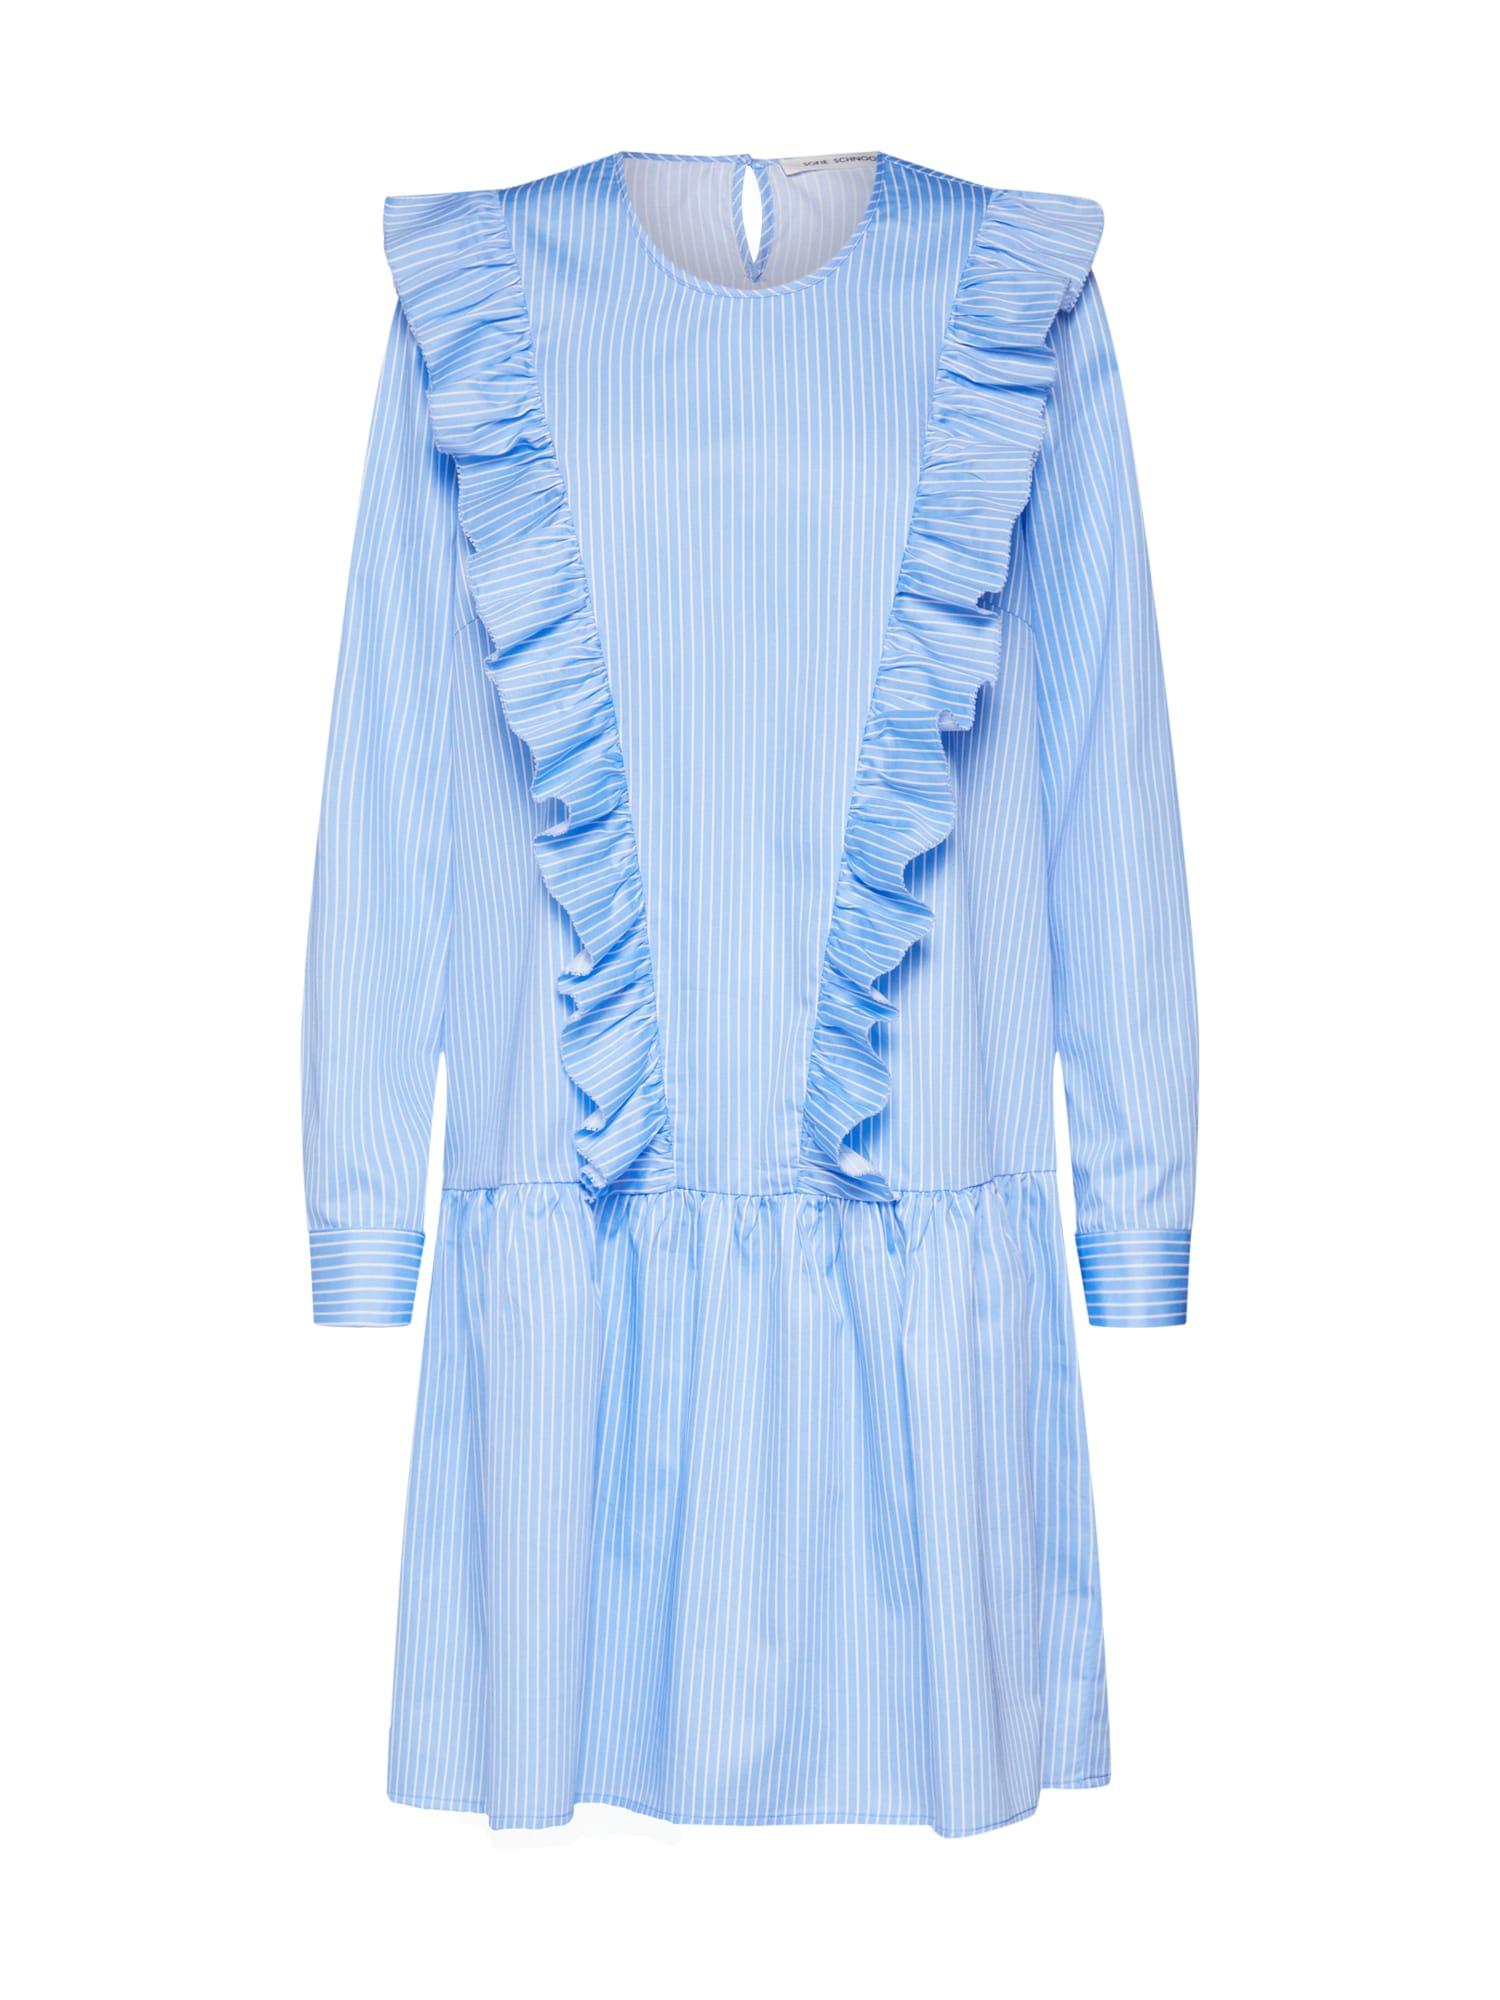 Letní šaty S191256 modrá Sofie Schnoor